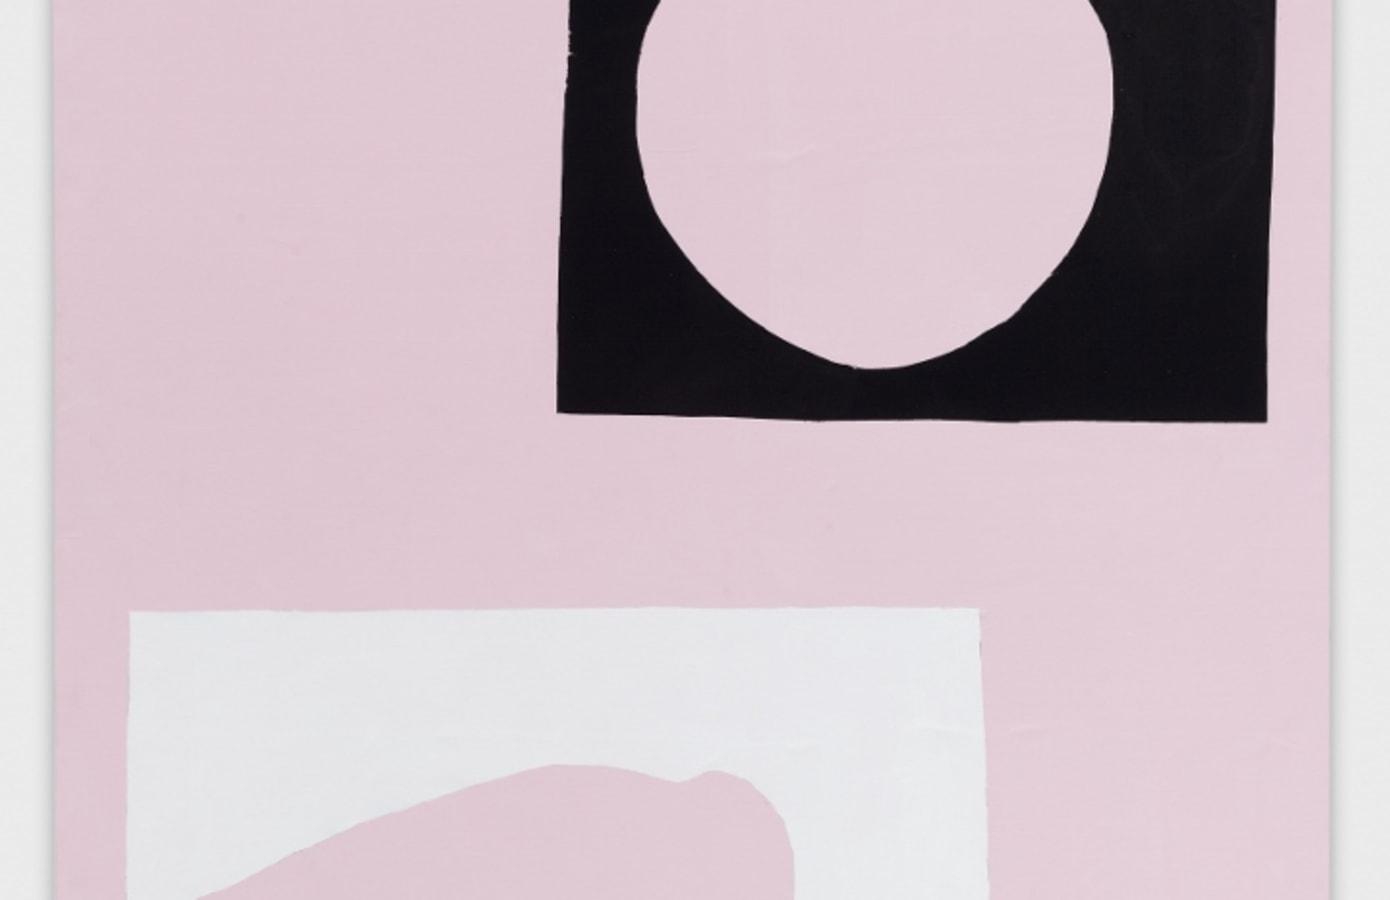 DOLORES | Linus Bill + Adrien Horni, Linus Bill + Adrien Horni,